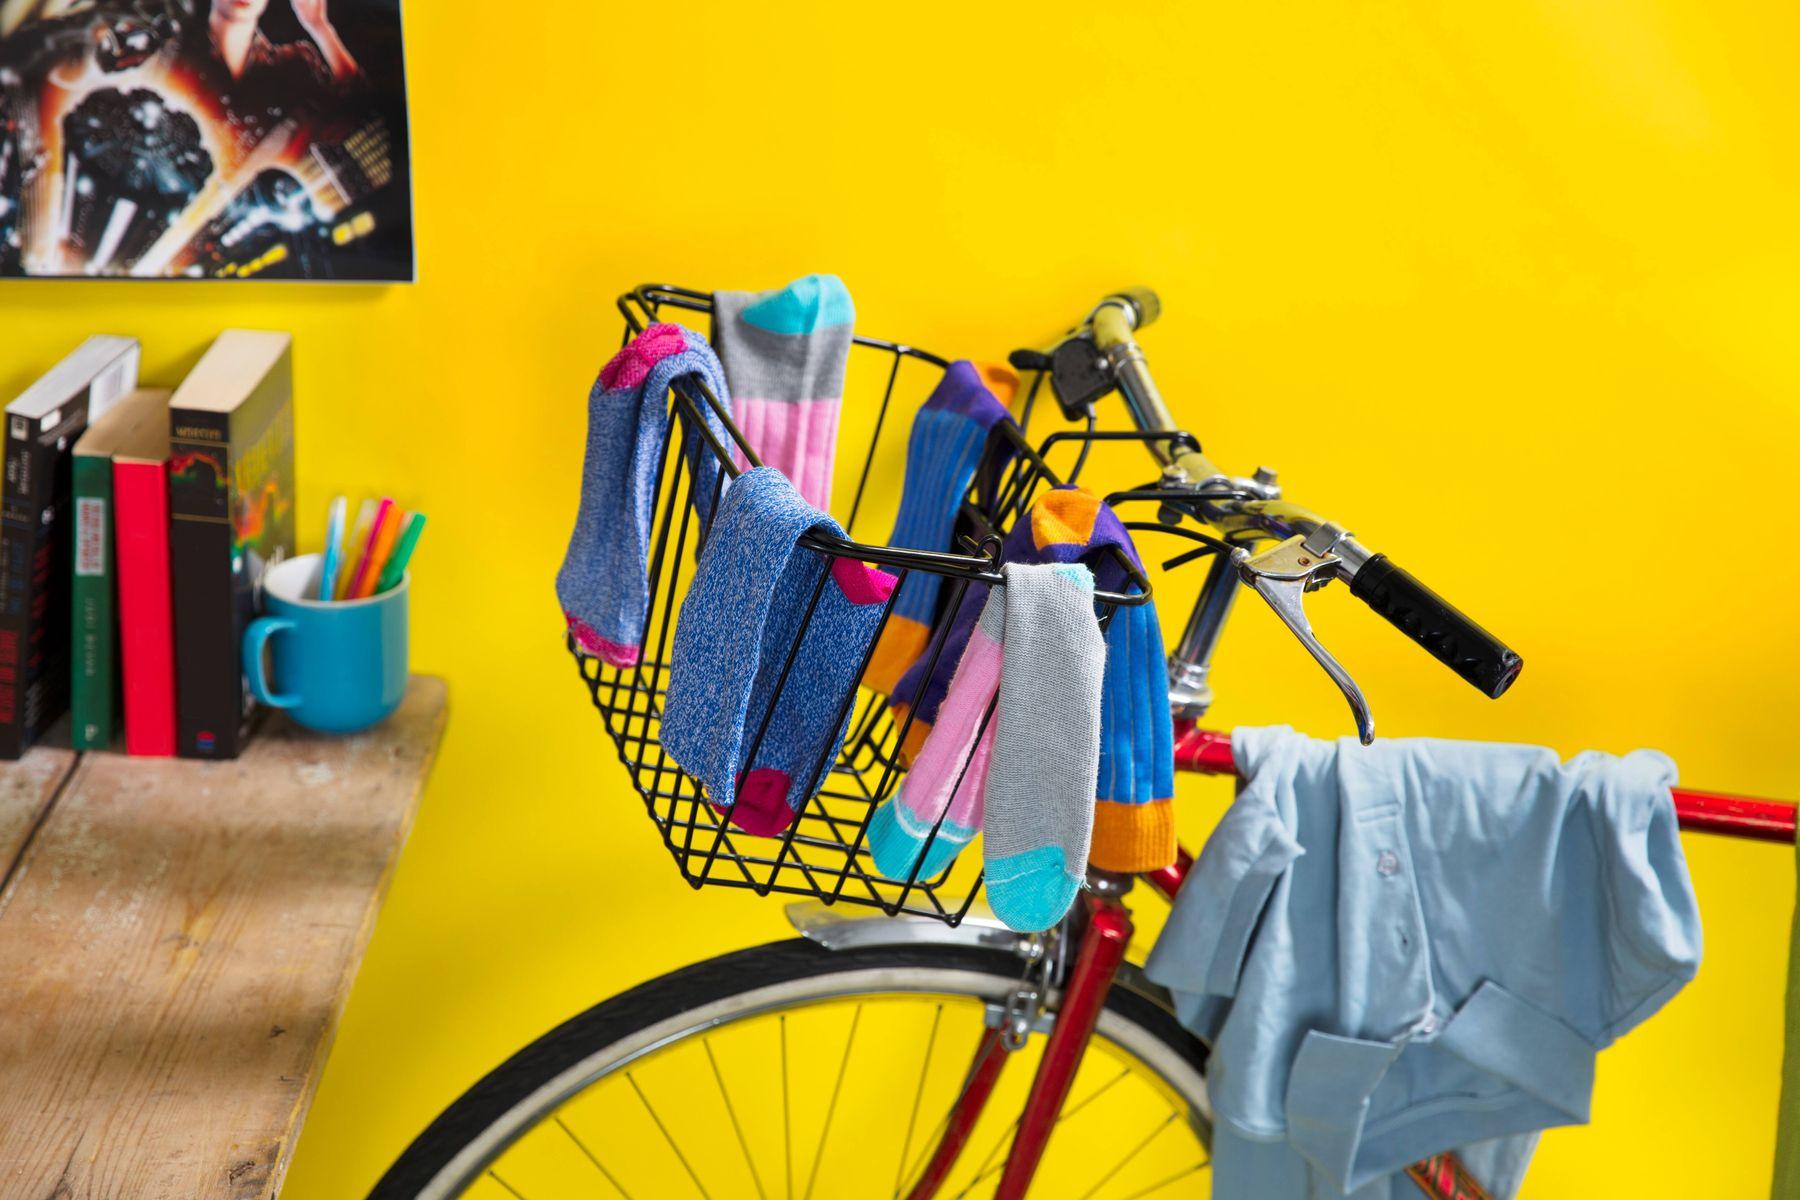 Mengeringkan kaos kaki di keranjang sepeda